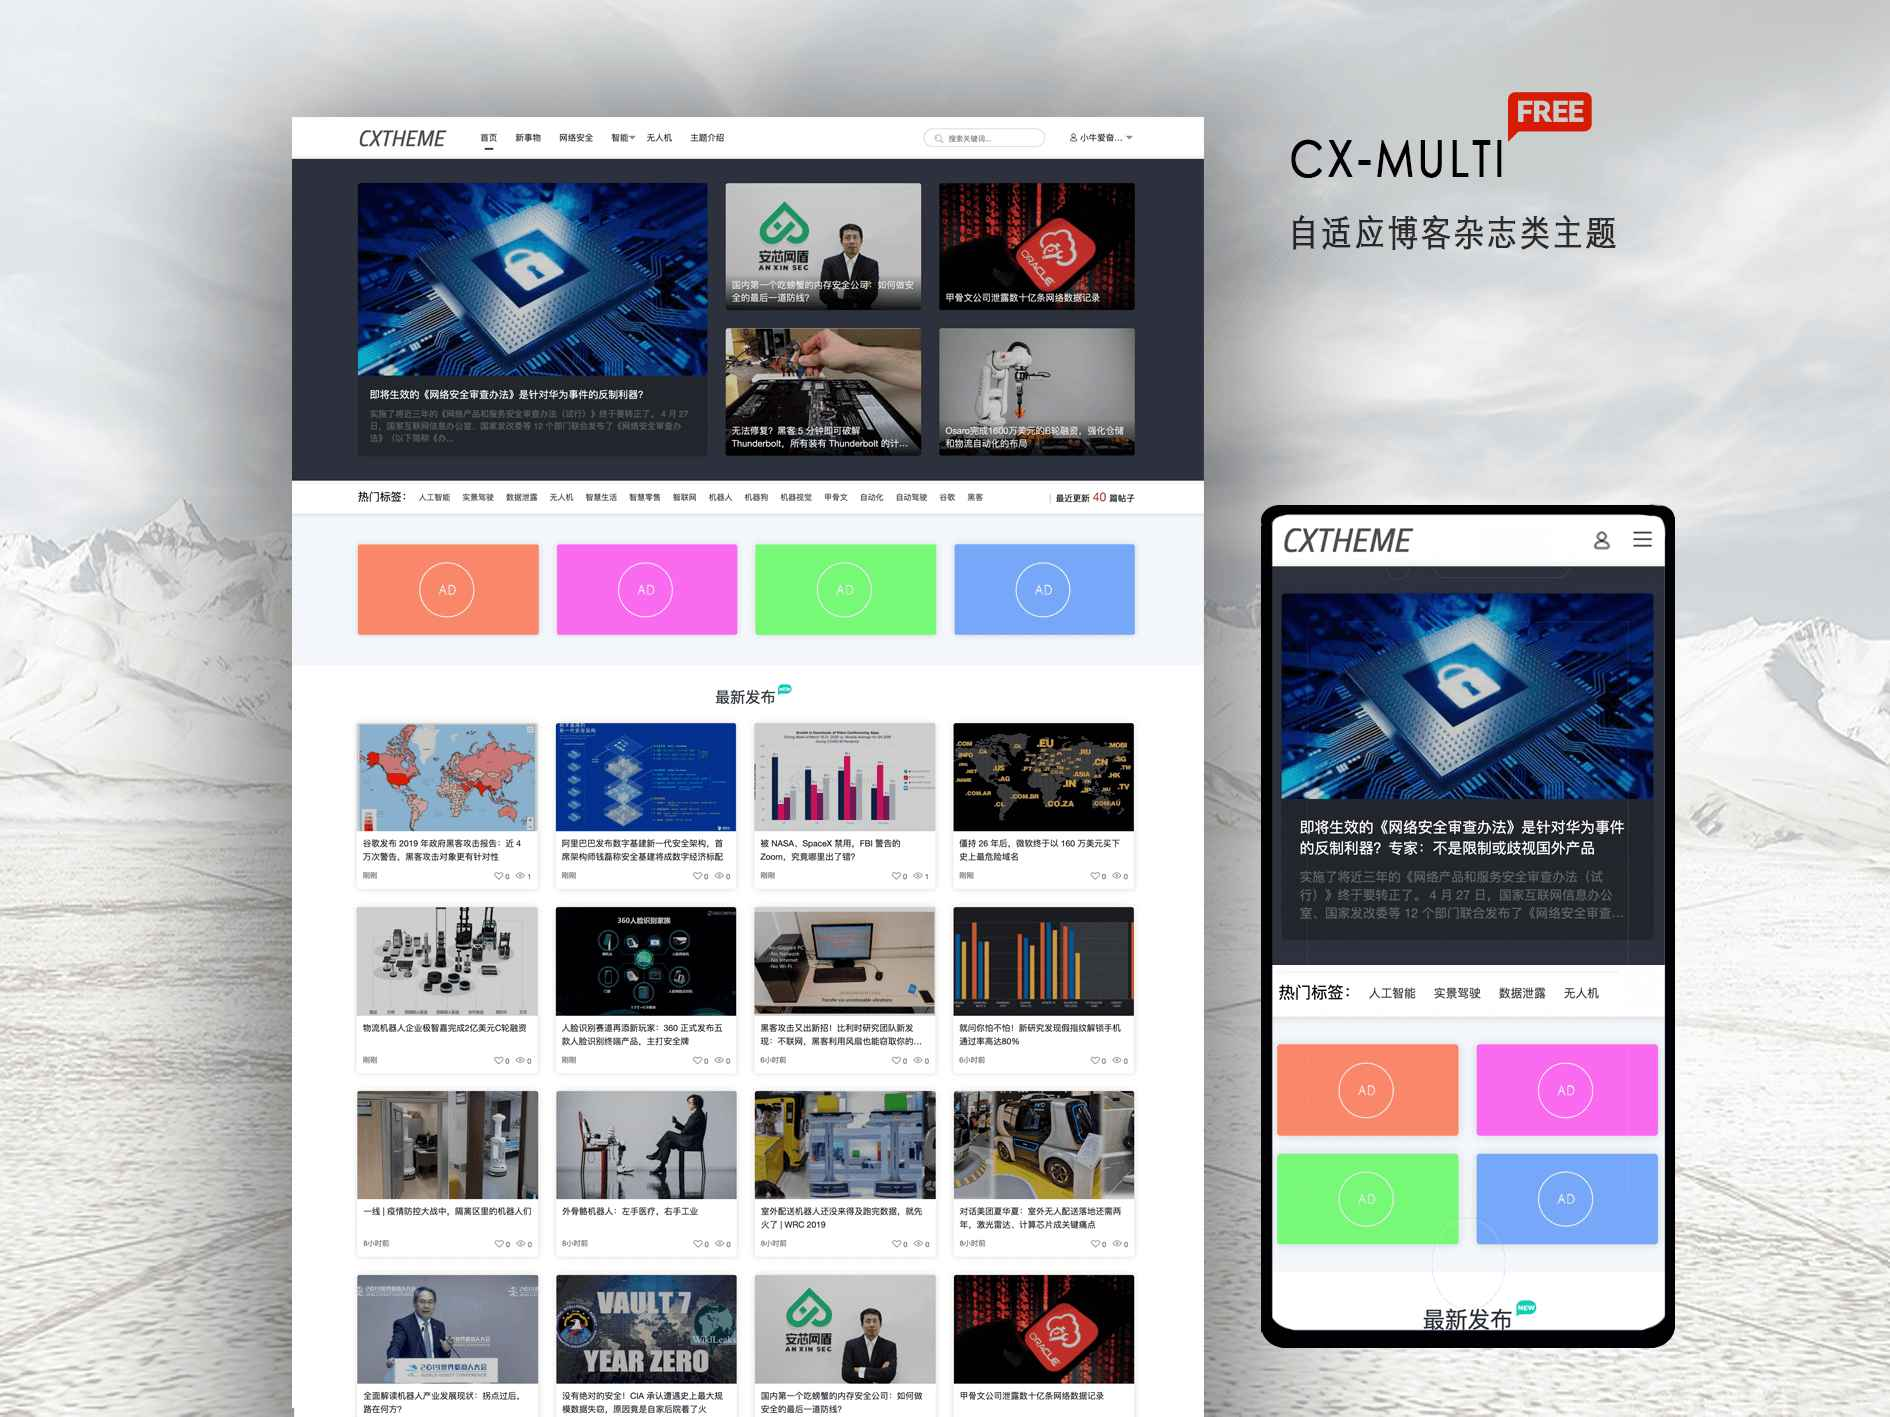 WordPress简洁大气自适应博客杂志类免费主题CX-MULTI发布插图